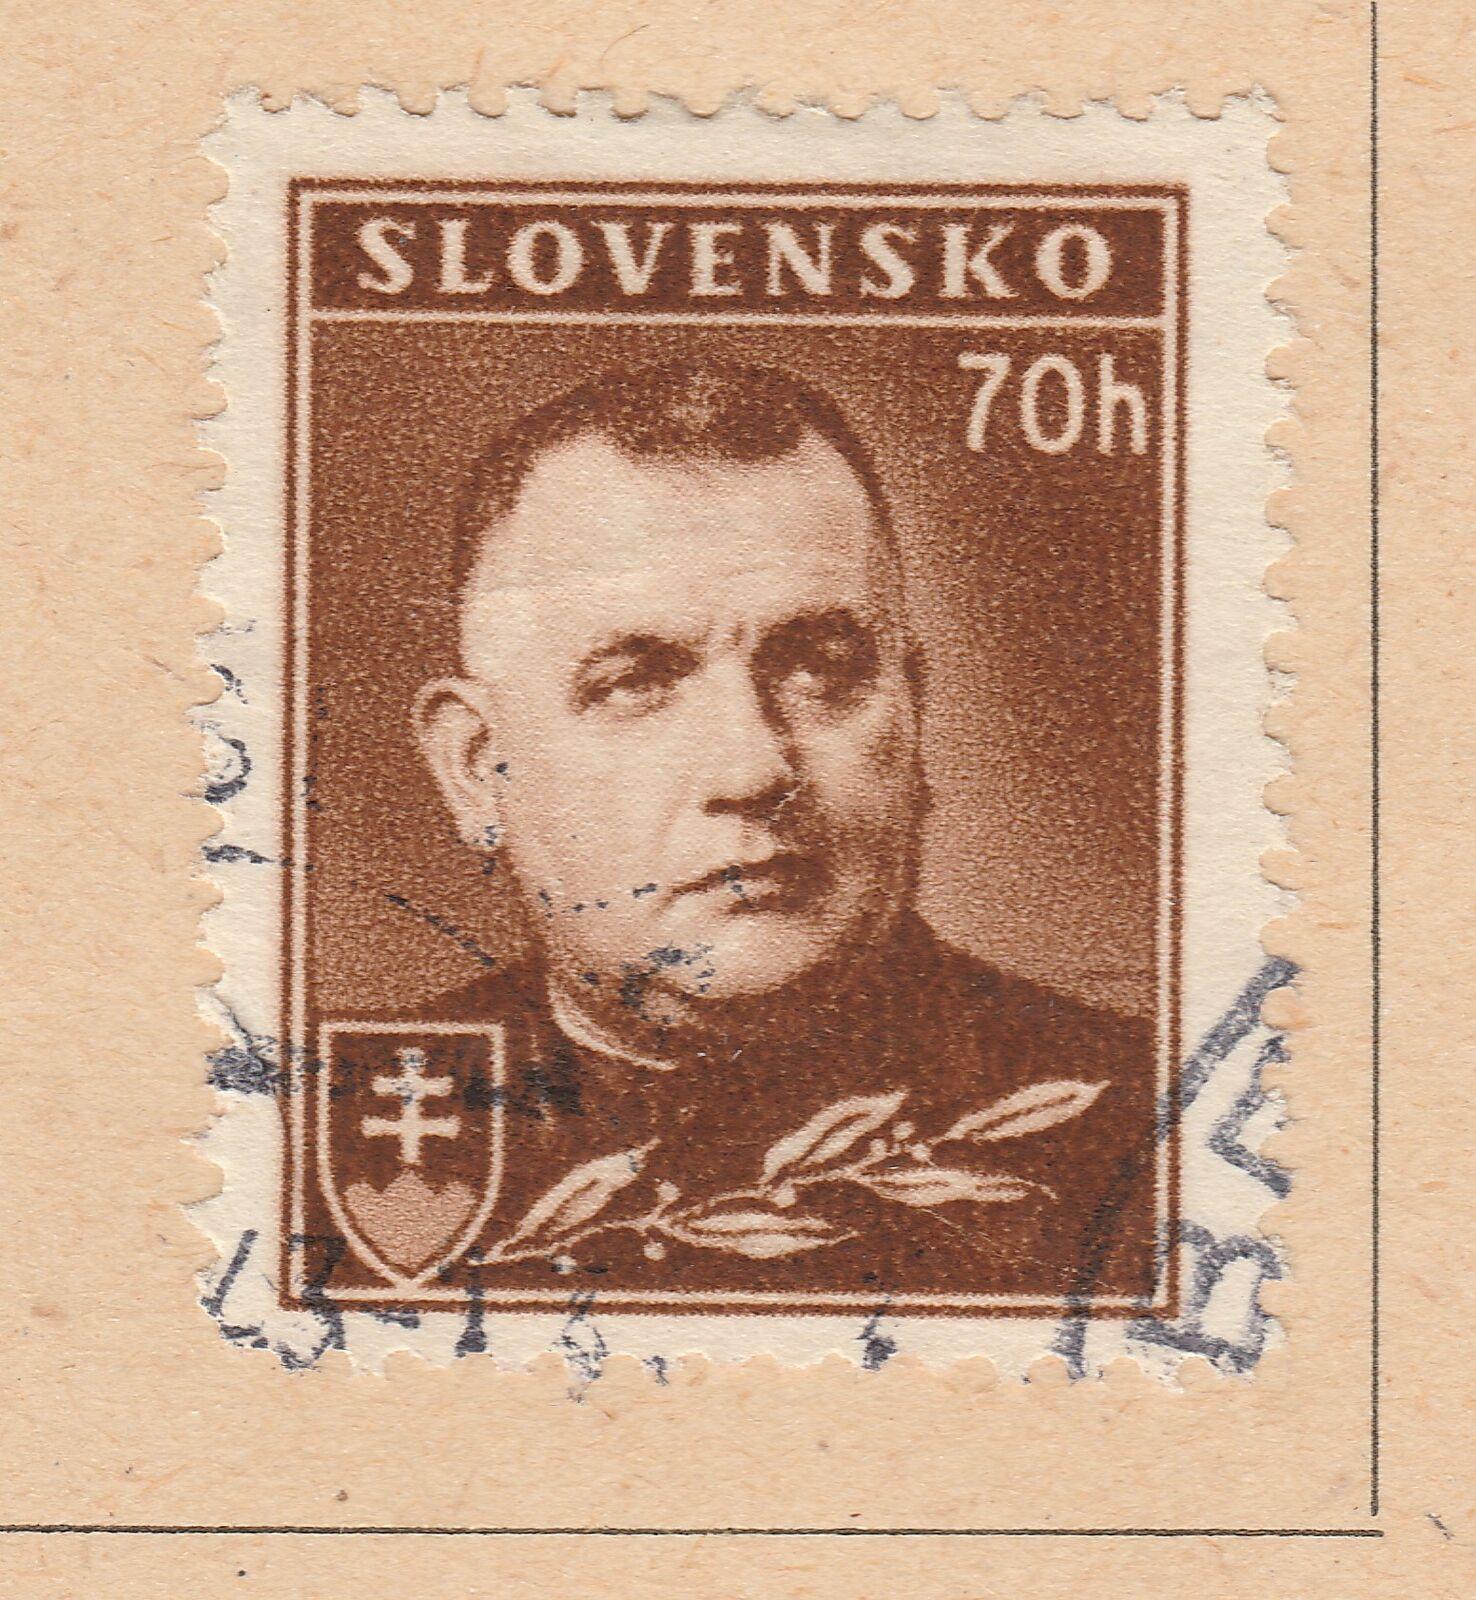 A5P57F204 Slovakia 1939-43 Wmk Cross Multiple 70h used